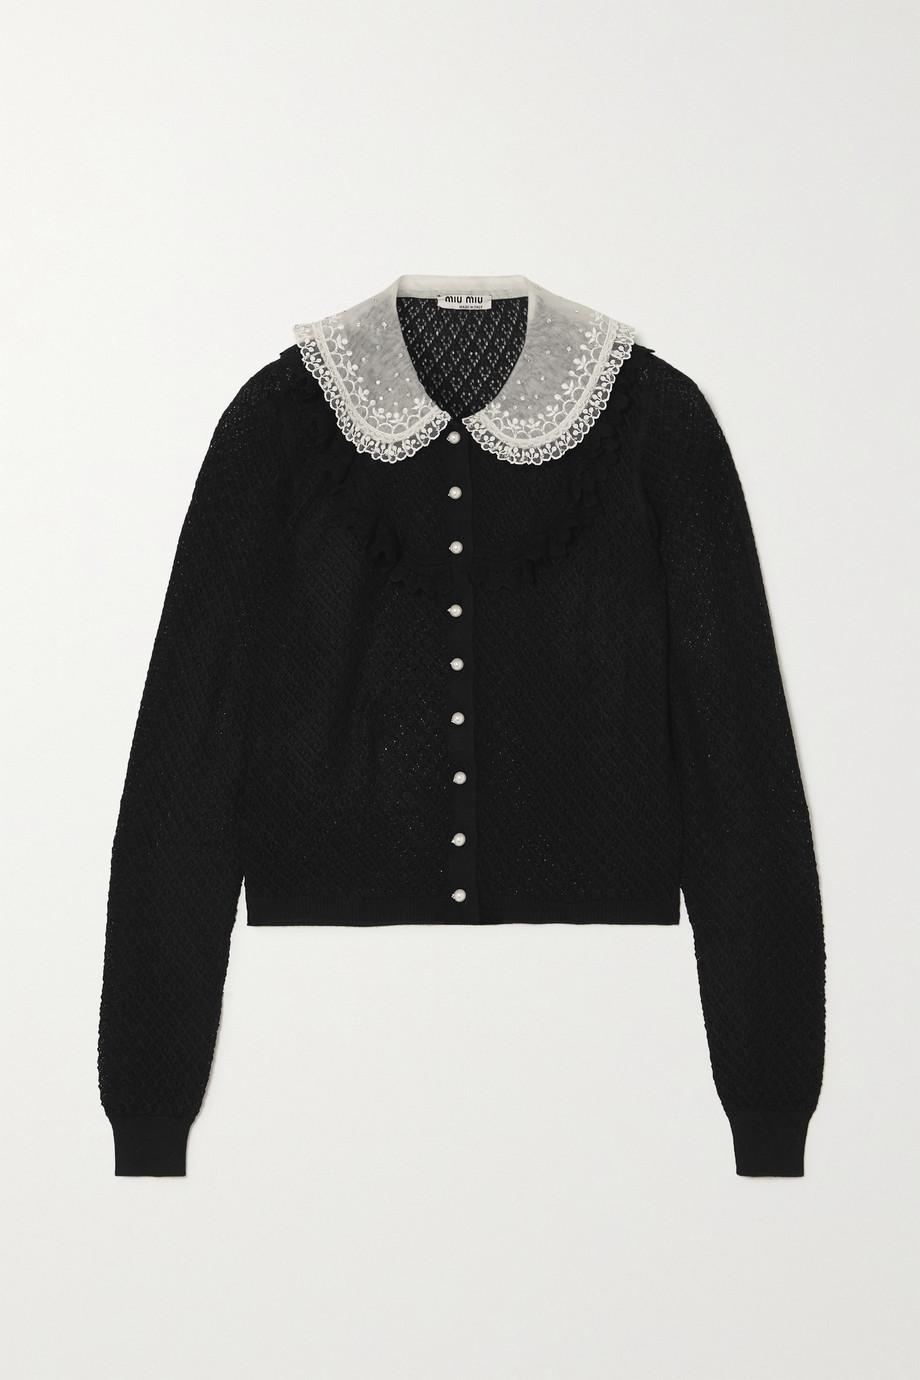 Miu Miu Crystal-embellished ruffled cashmere and silk-blend cardigan